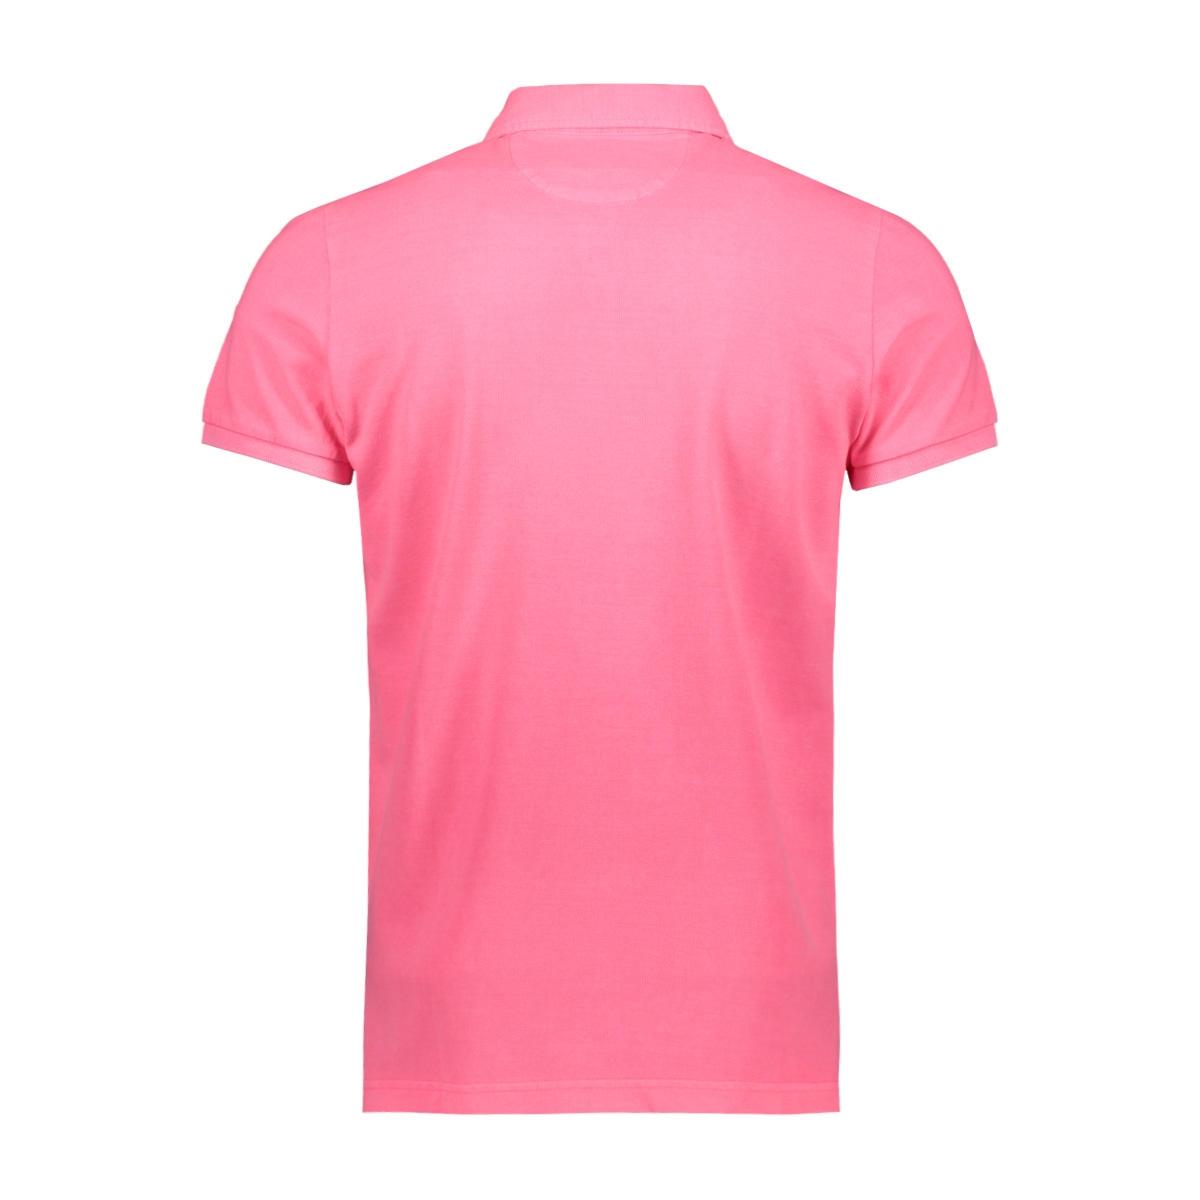 karoro 19bn100 nza polo 690 neon pink